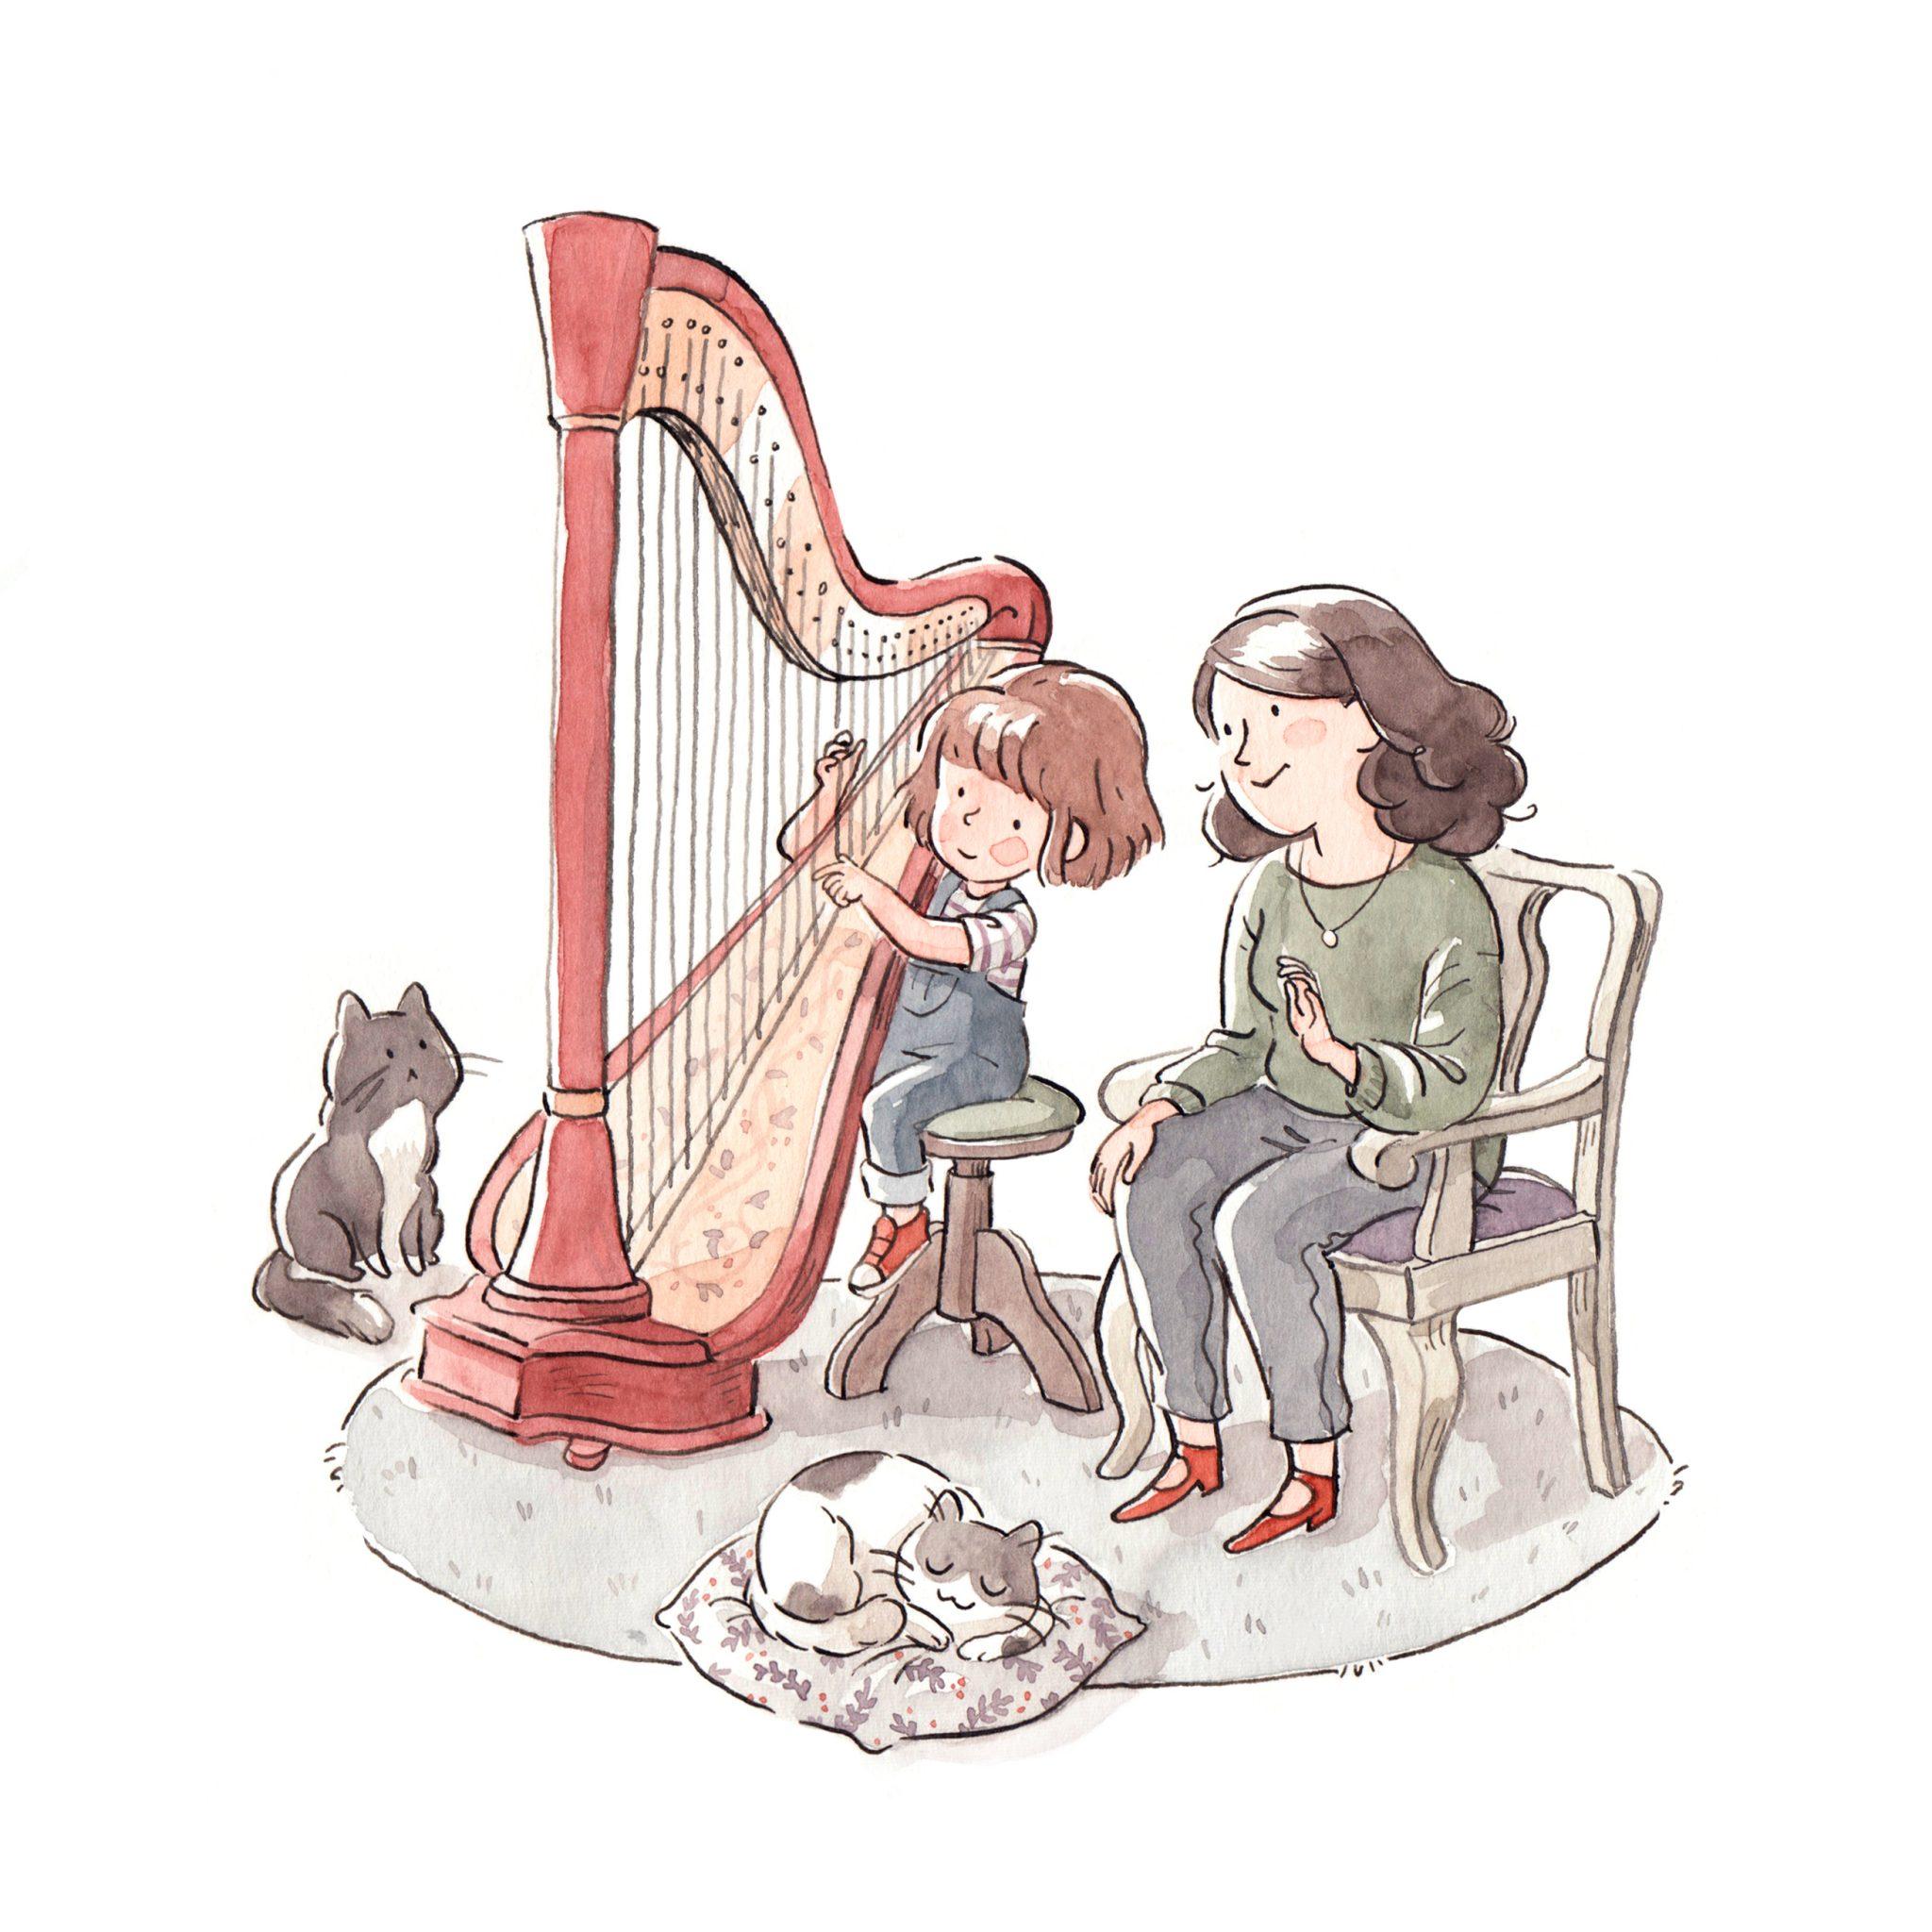 Harples Anja Goossenaerts